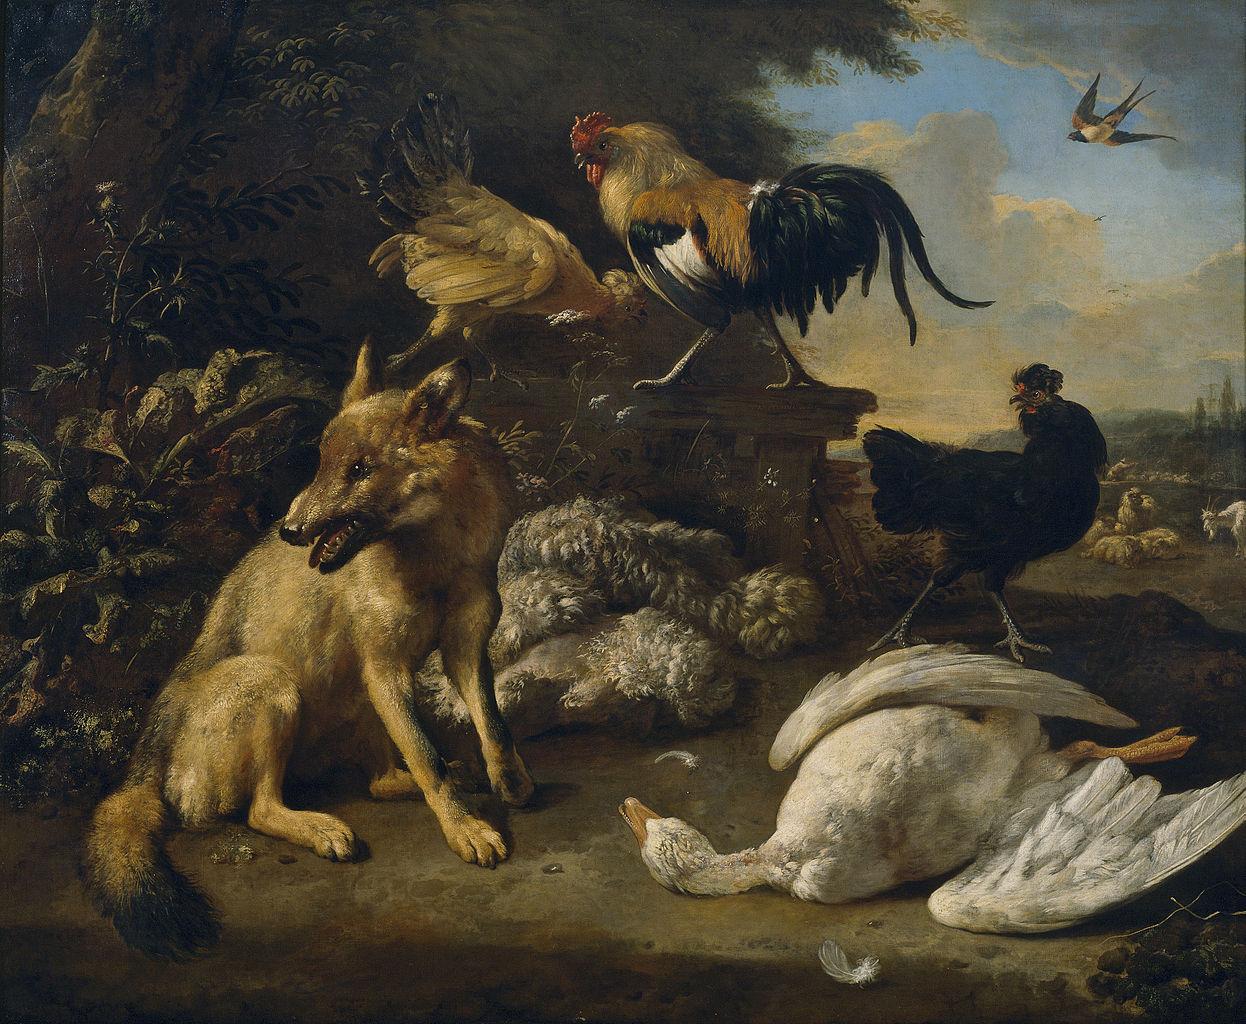 MELCHIOR DE HONDECOETER (1636- 1695).1246px-Bodegón_con_animales_(Hondecoeter).jpg